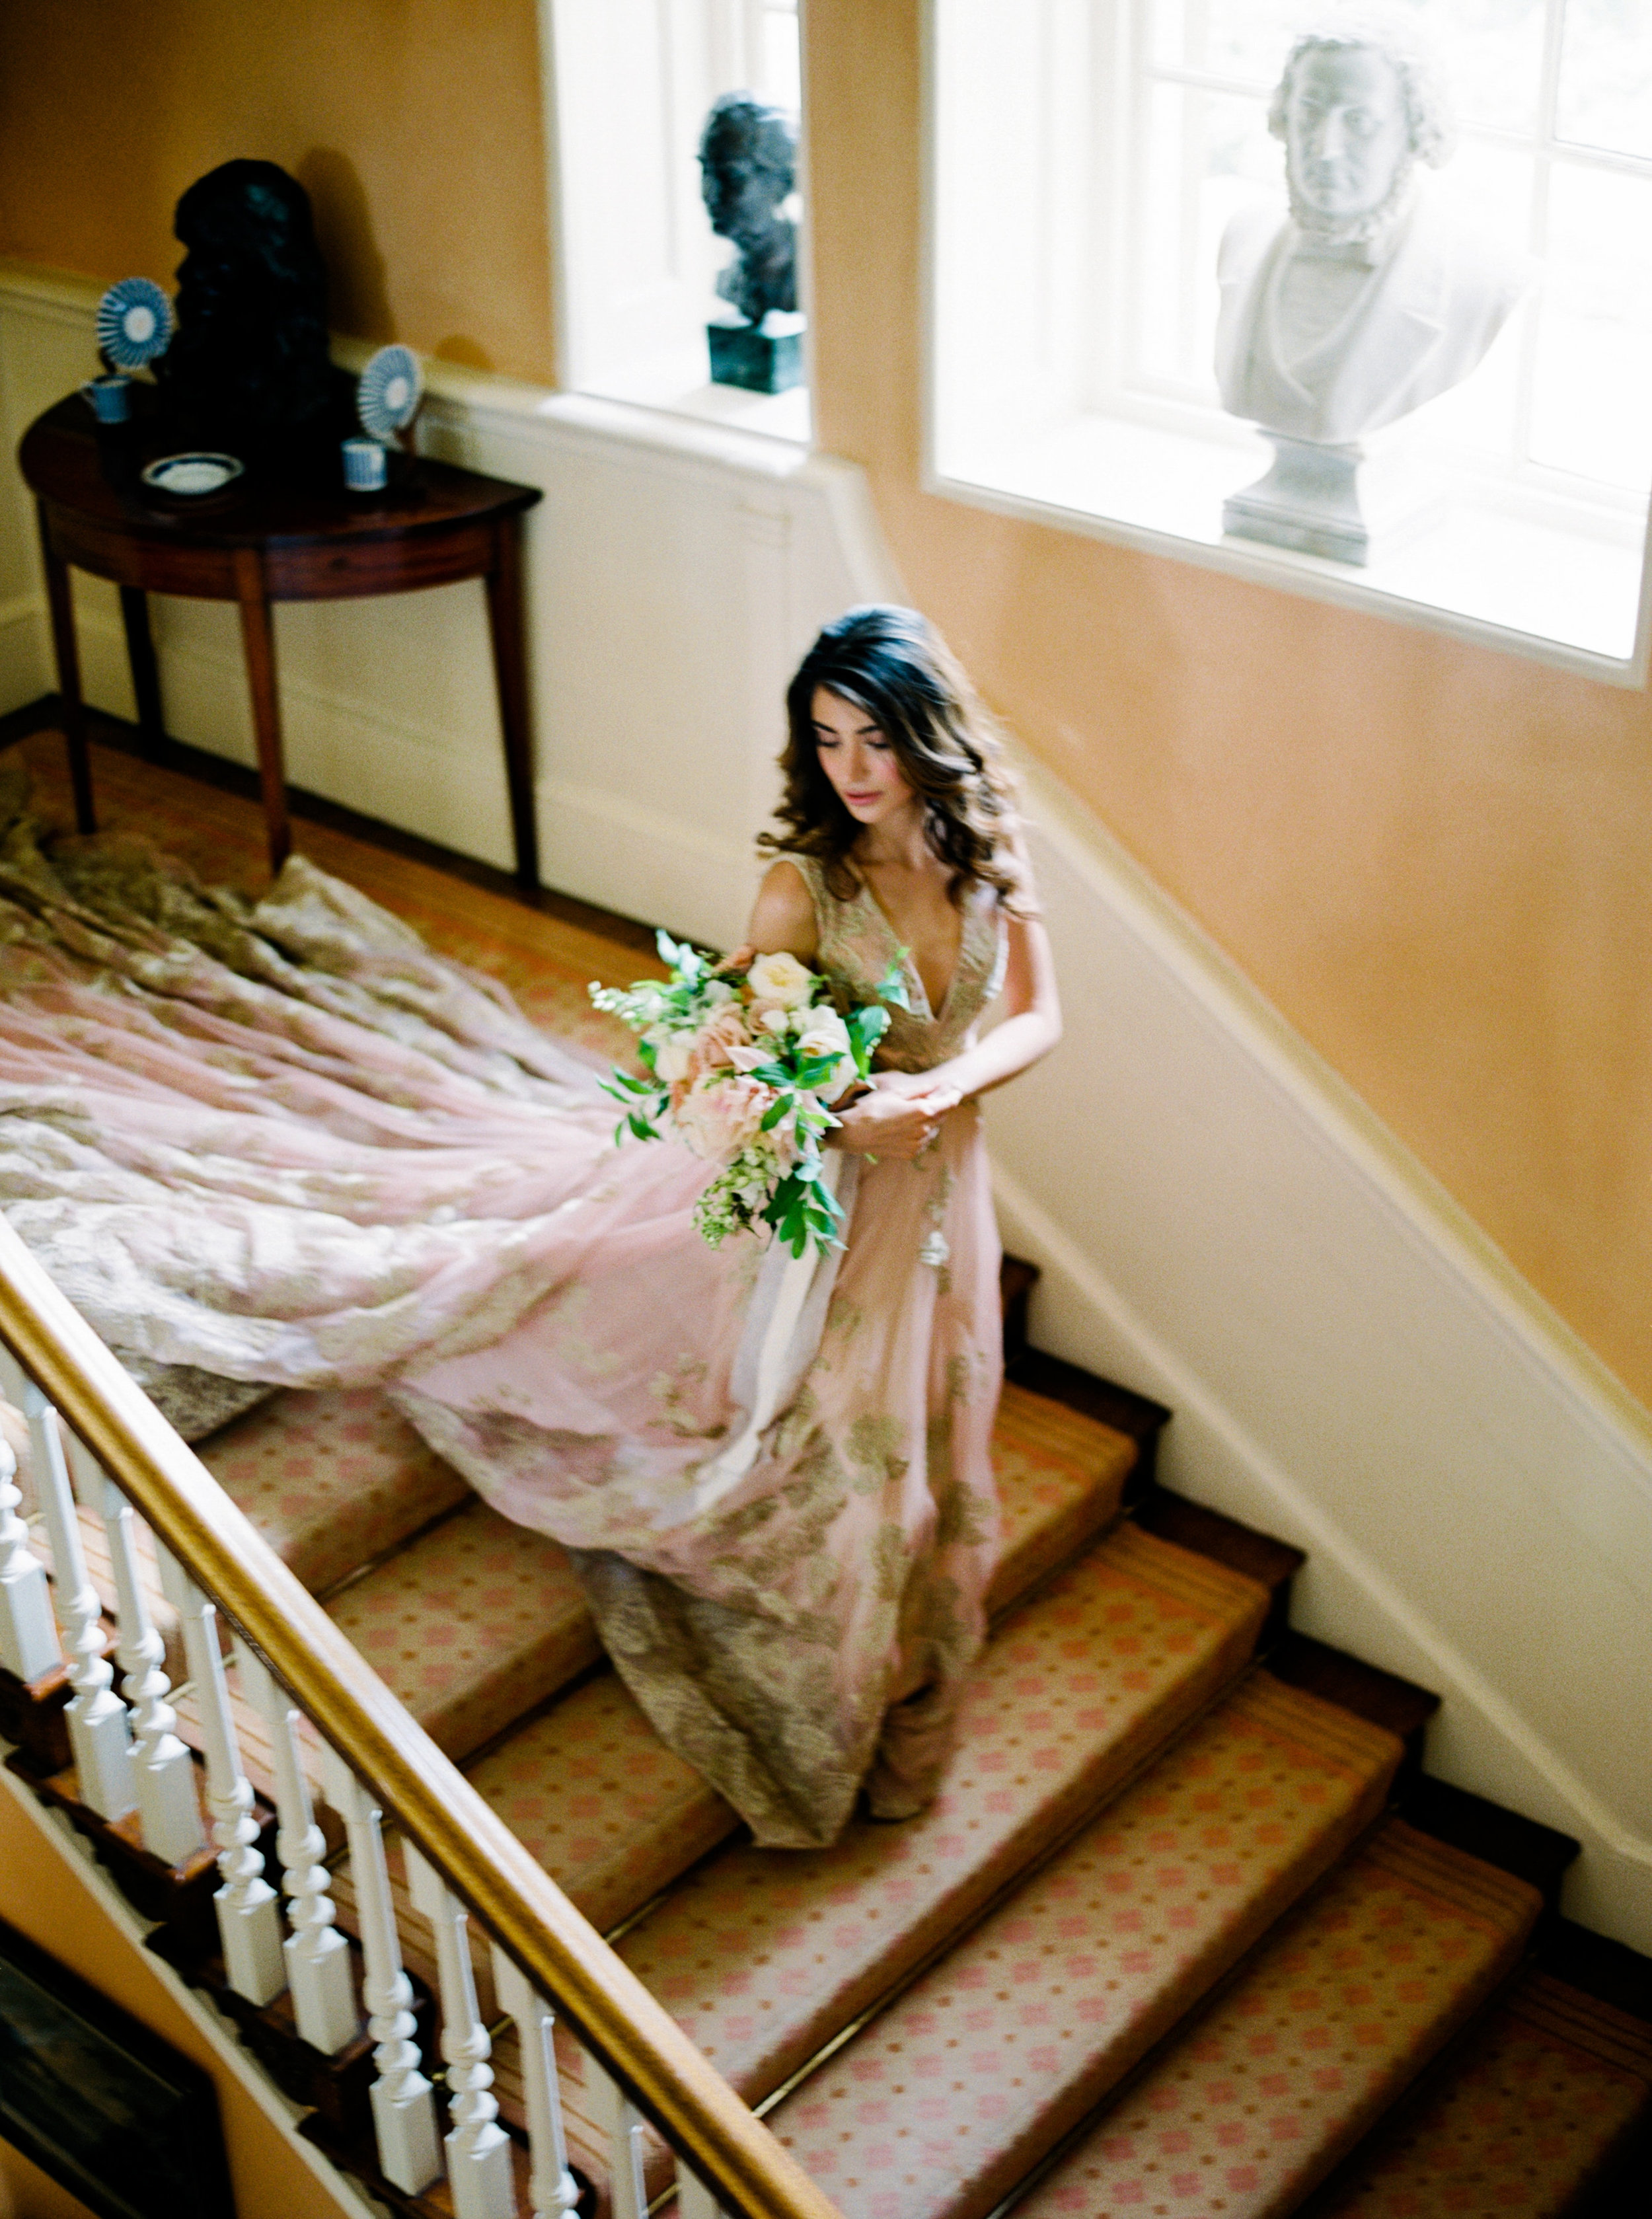 MelissaBlytheFineArtPhotography-CornwellManor_-11.jpg